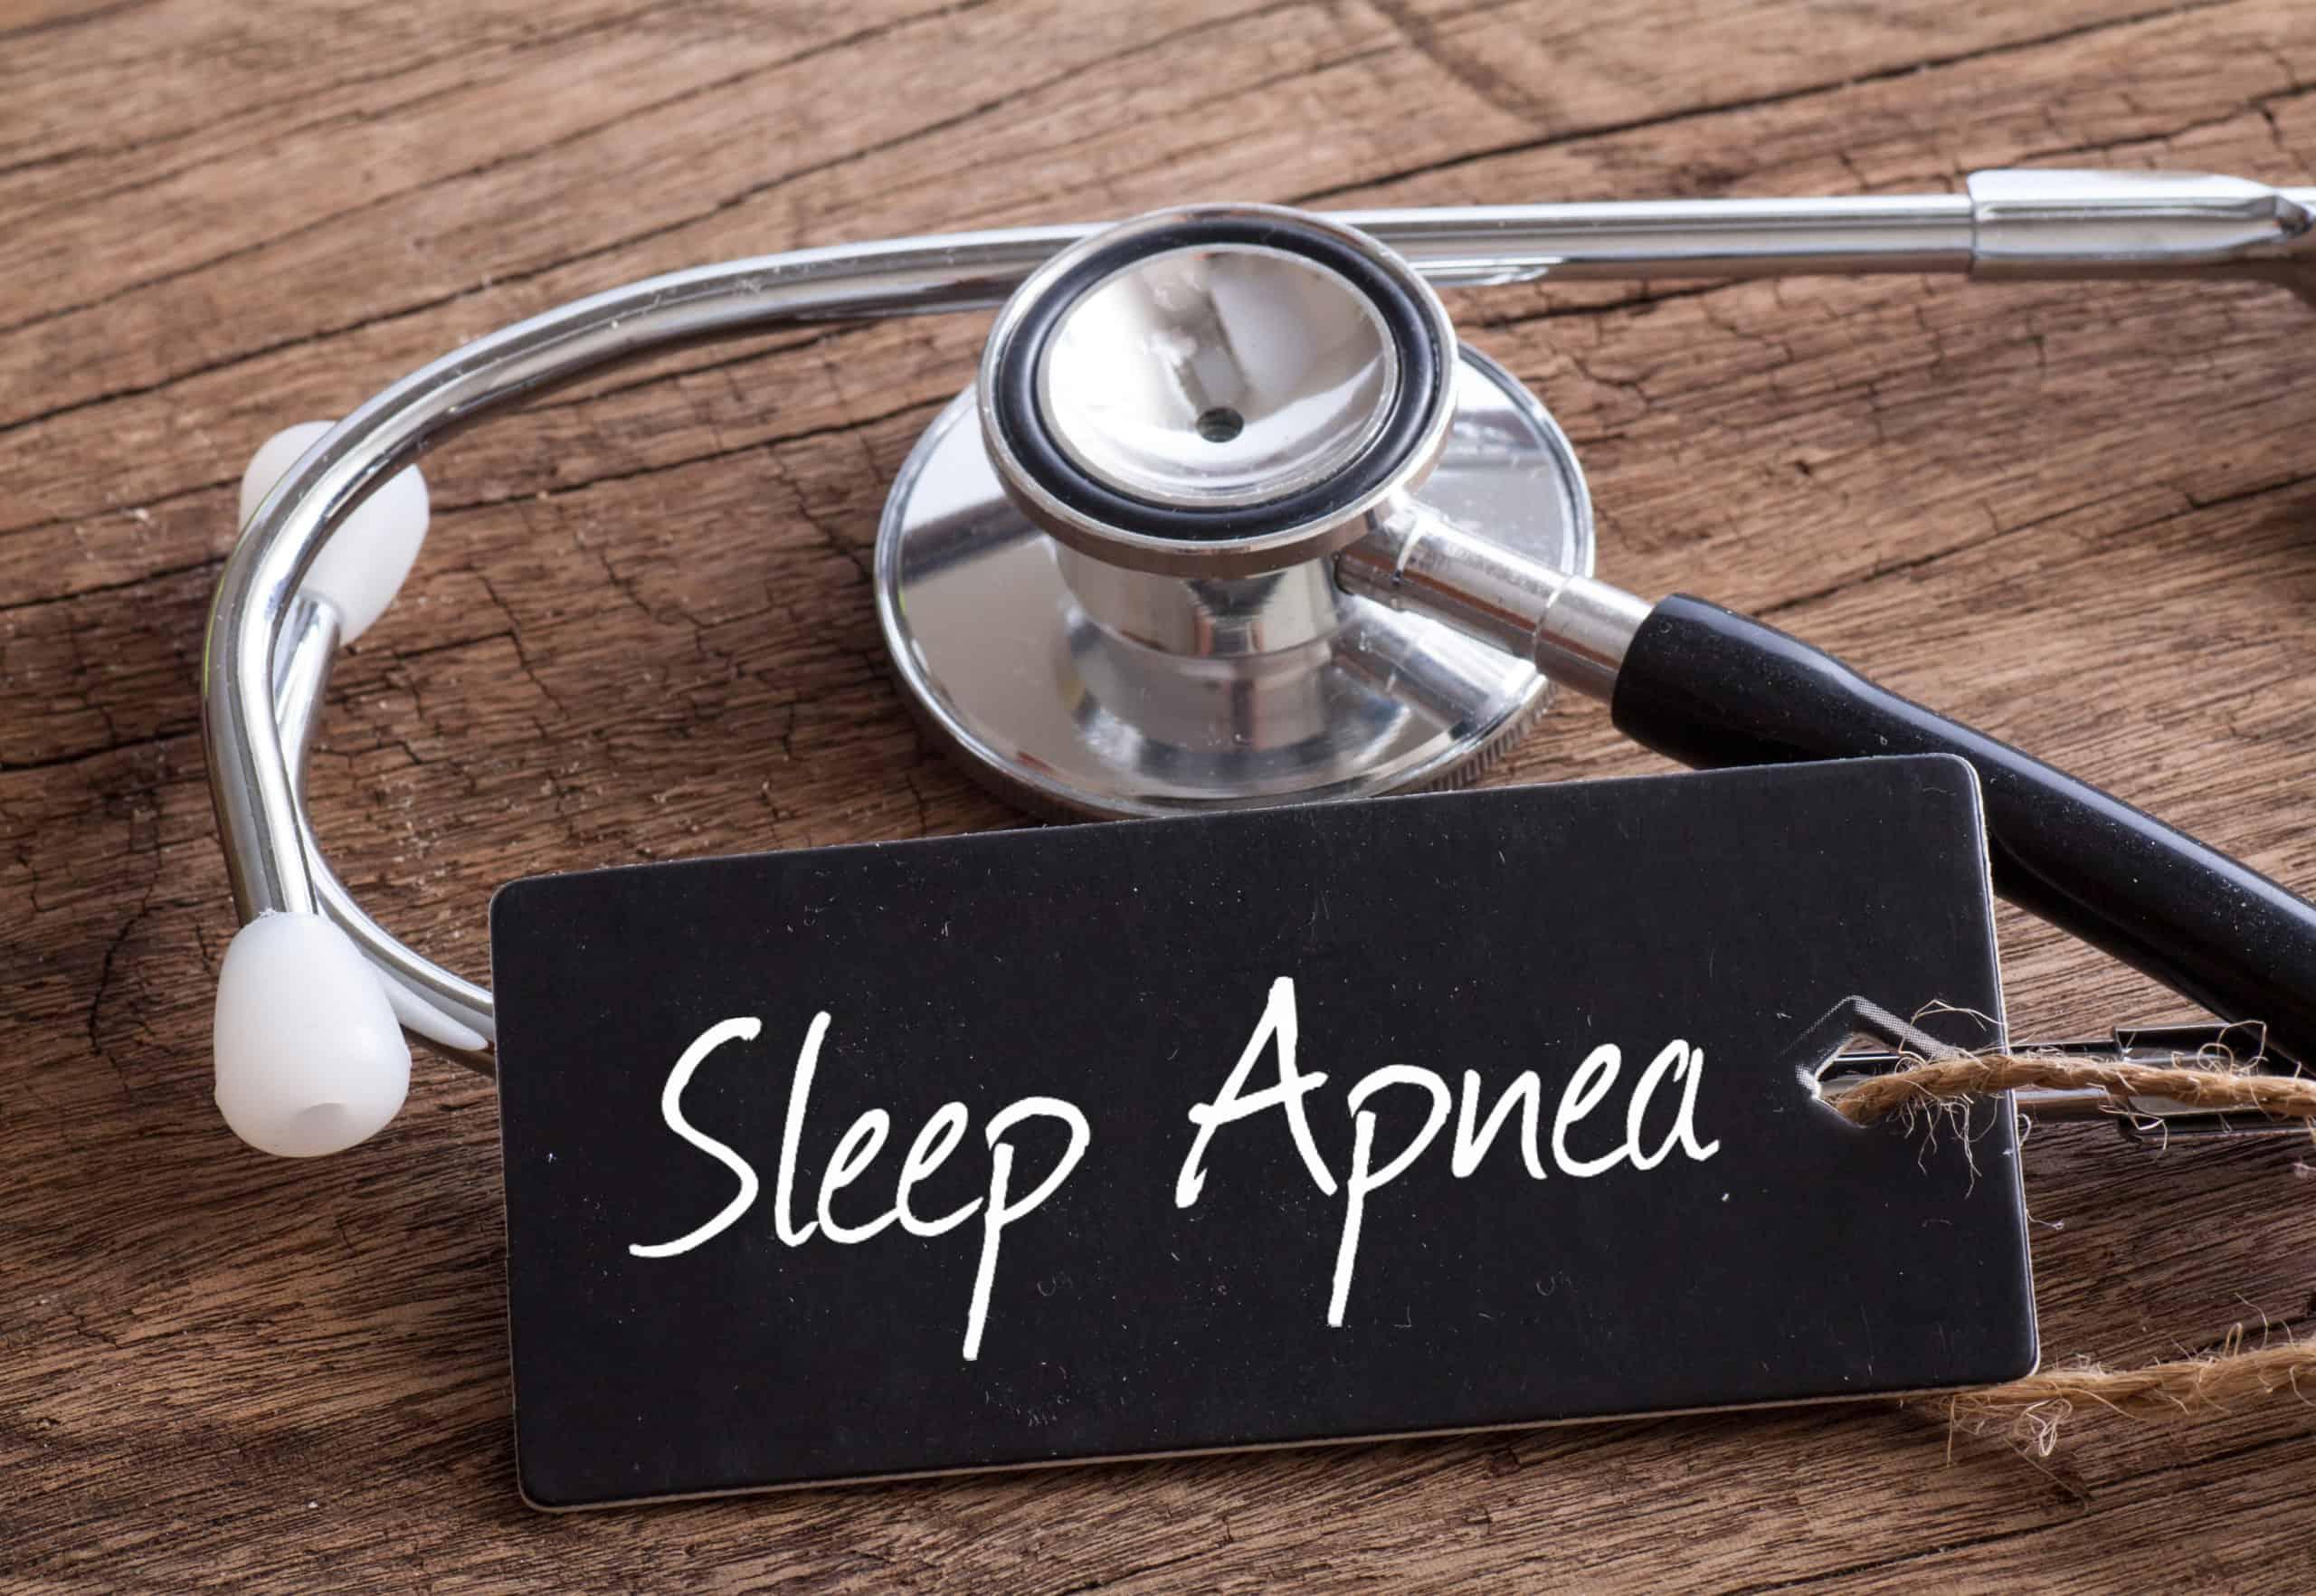 Sleep Apnea Treatment in Chicago, Evanston, & Skokie